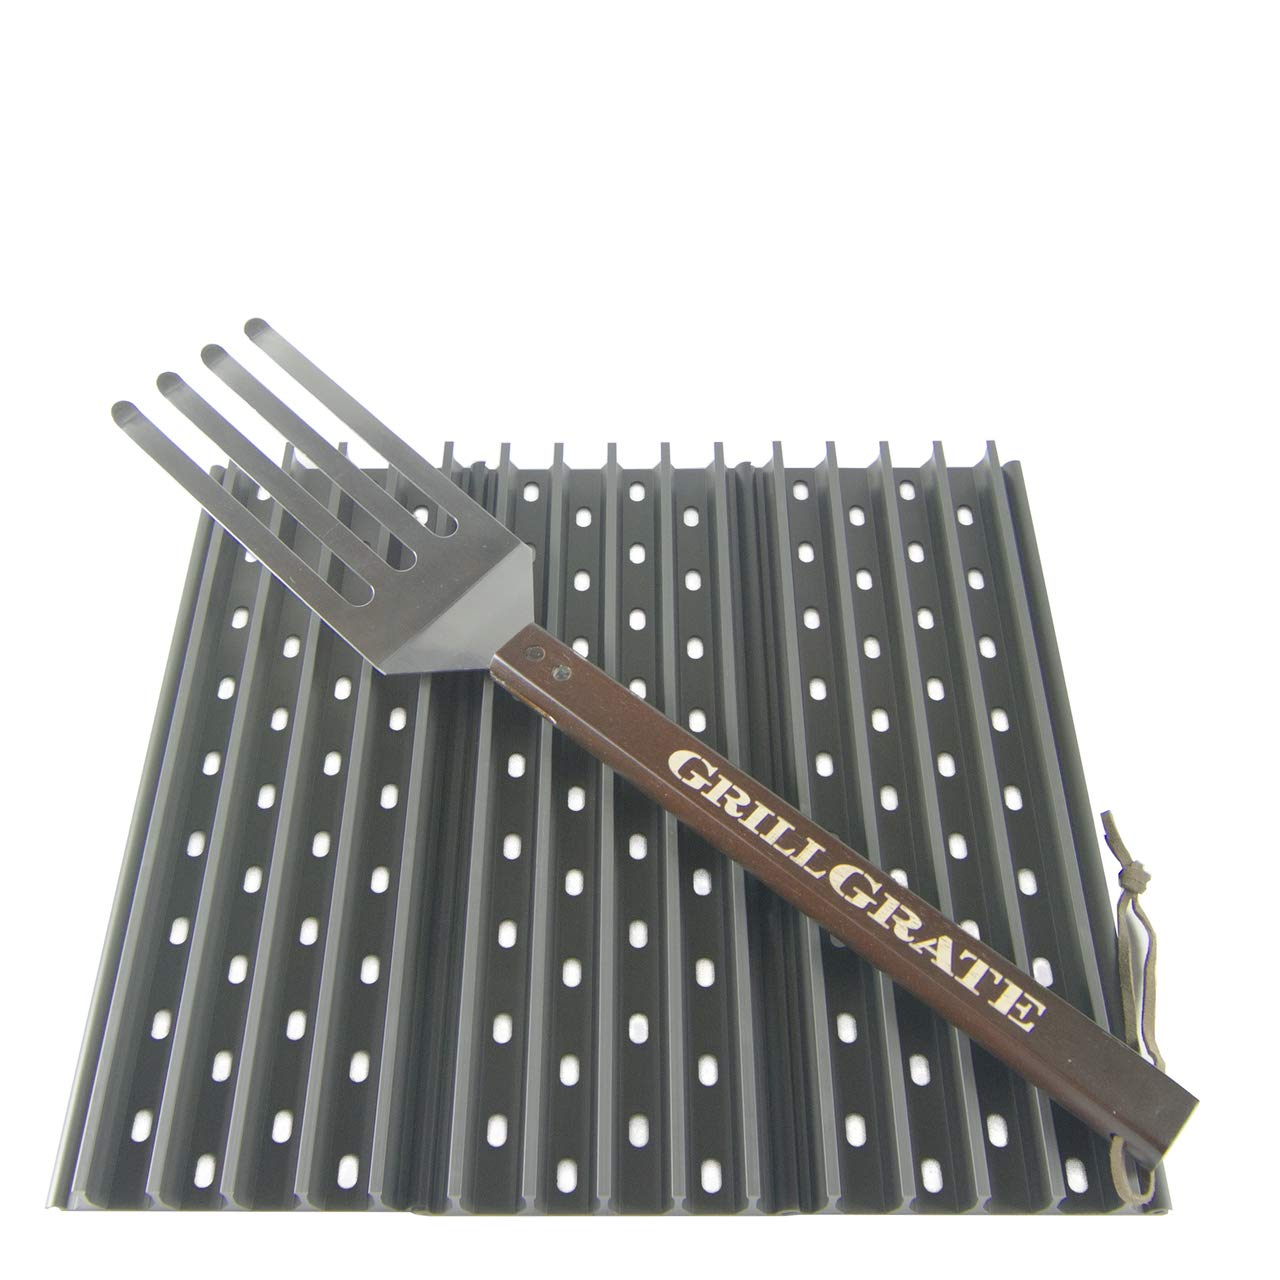 "GrillGrate Set of Three 13.75"" (Interlocking) + Grate Tool"